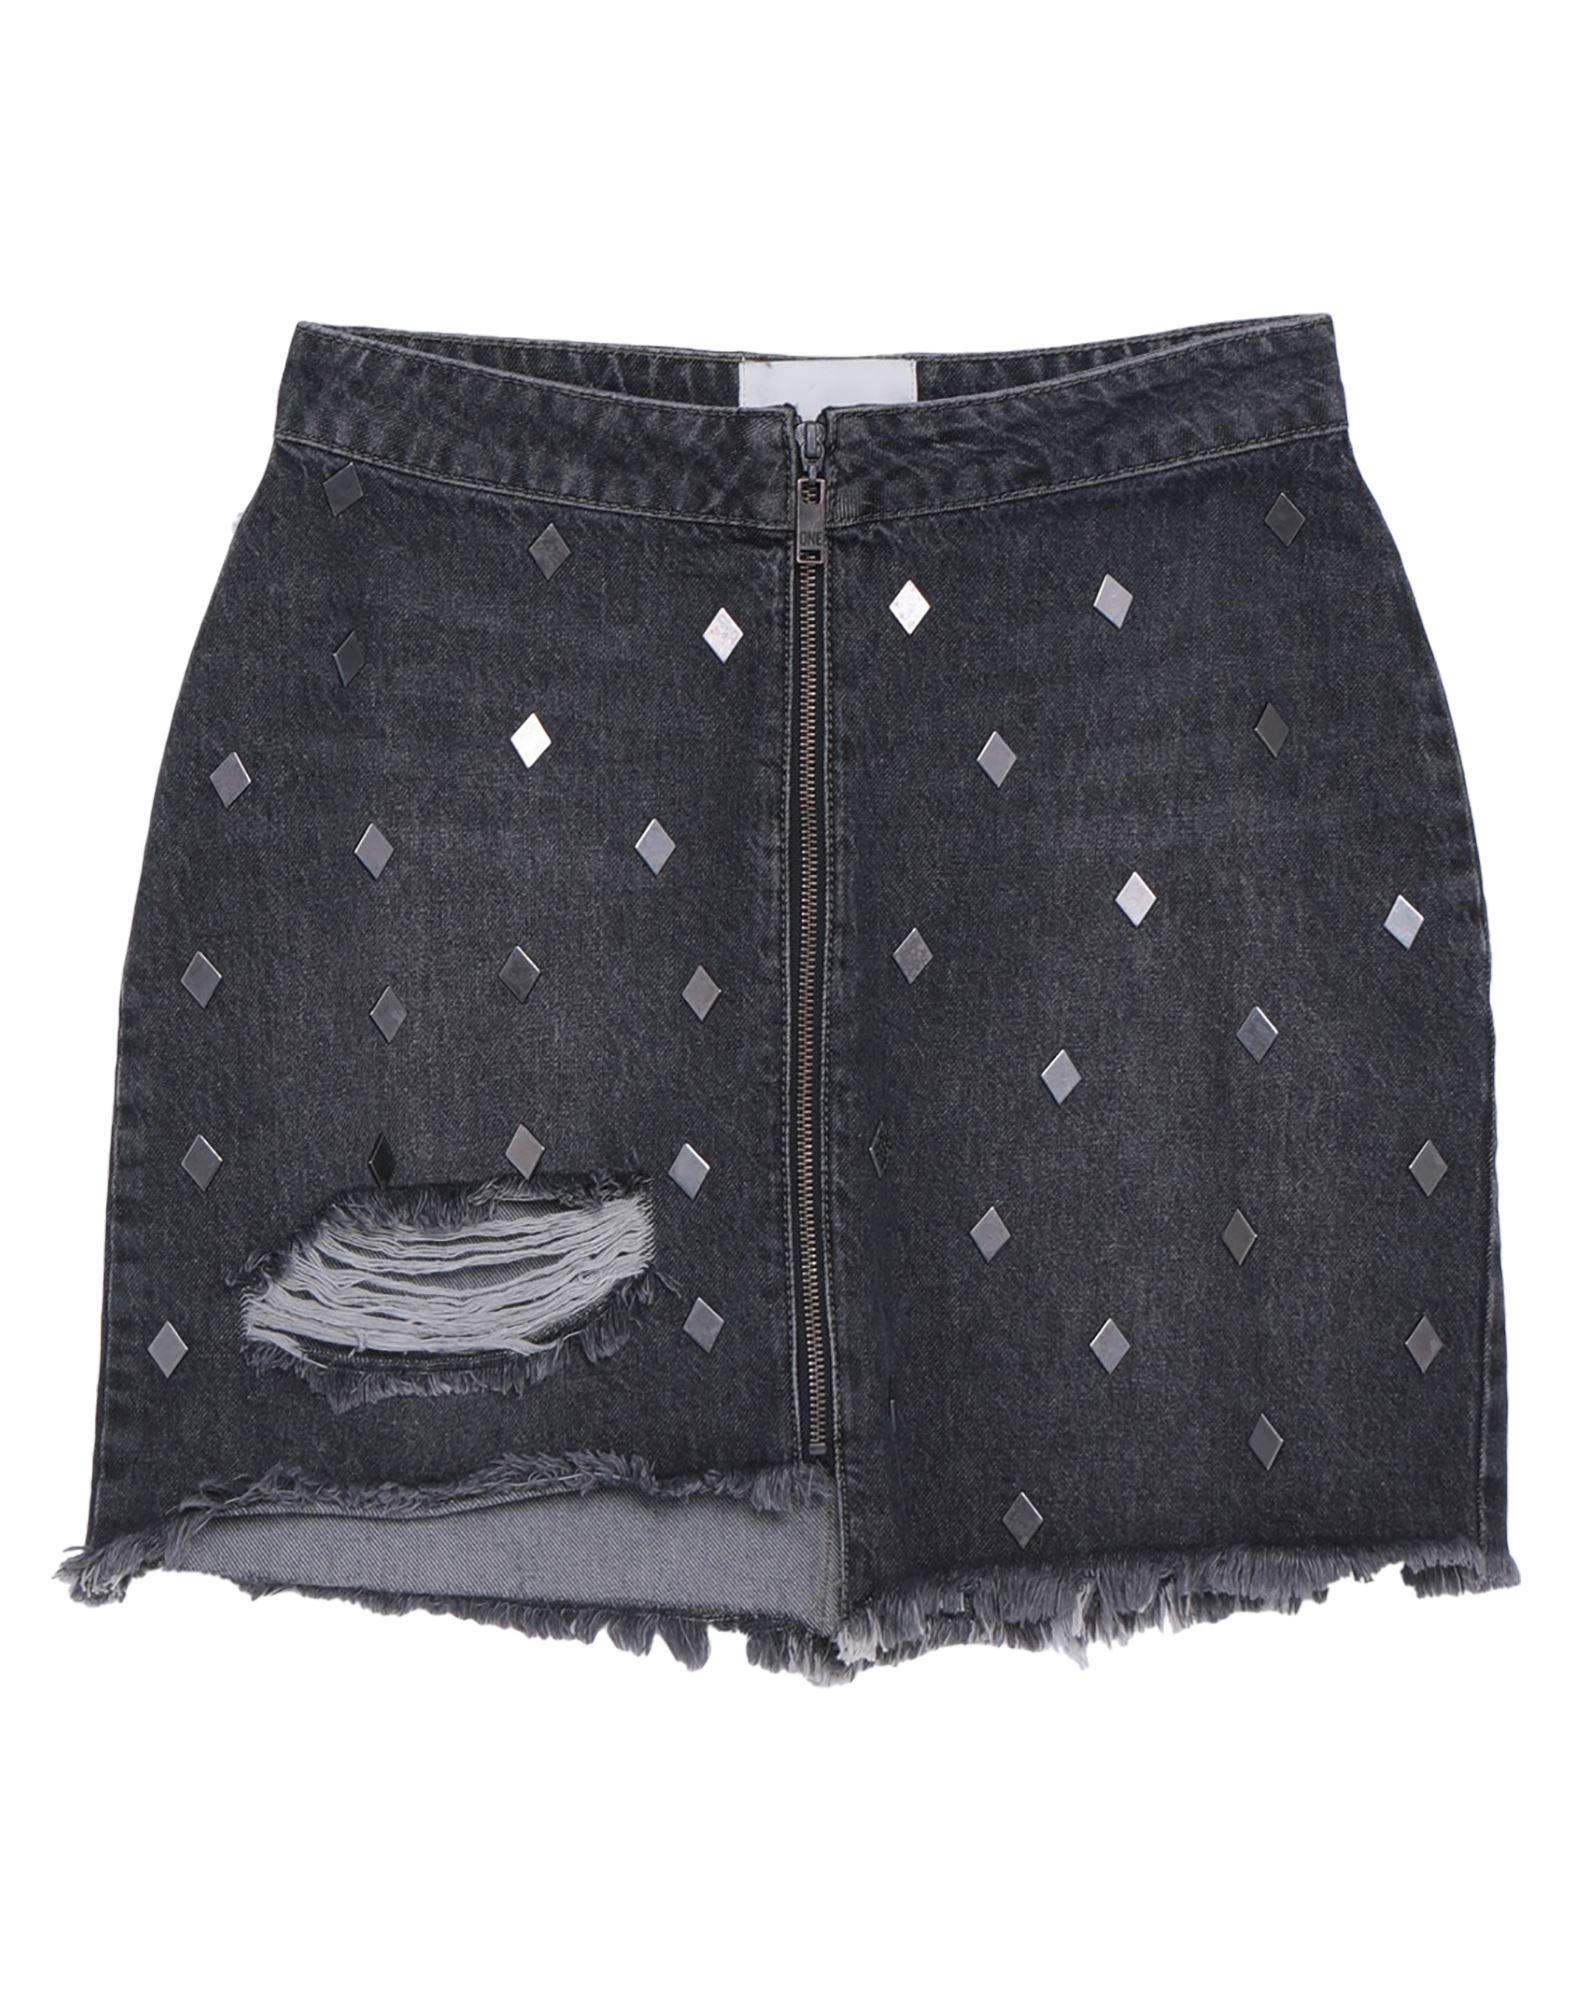 ONE x ONETEASPOON Denim skirts - Item 42825584